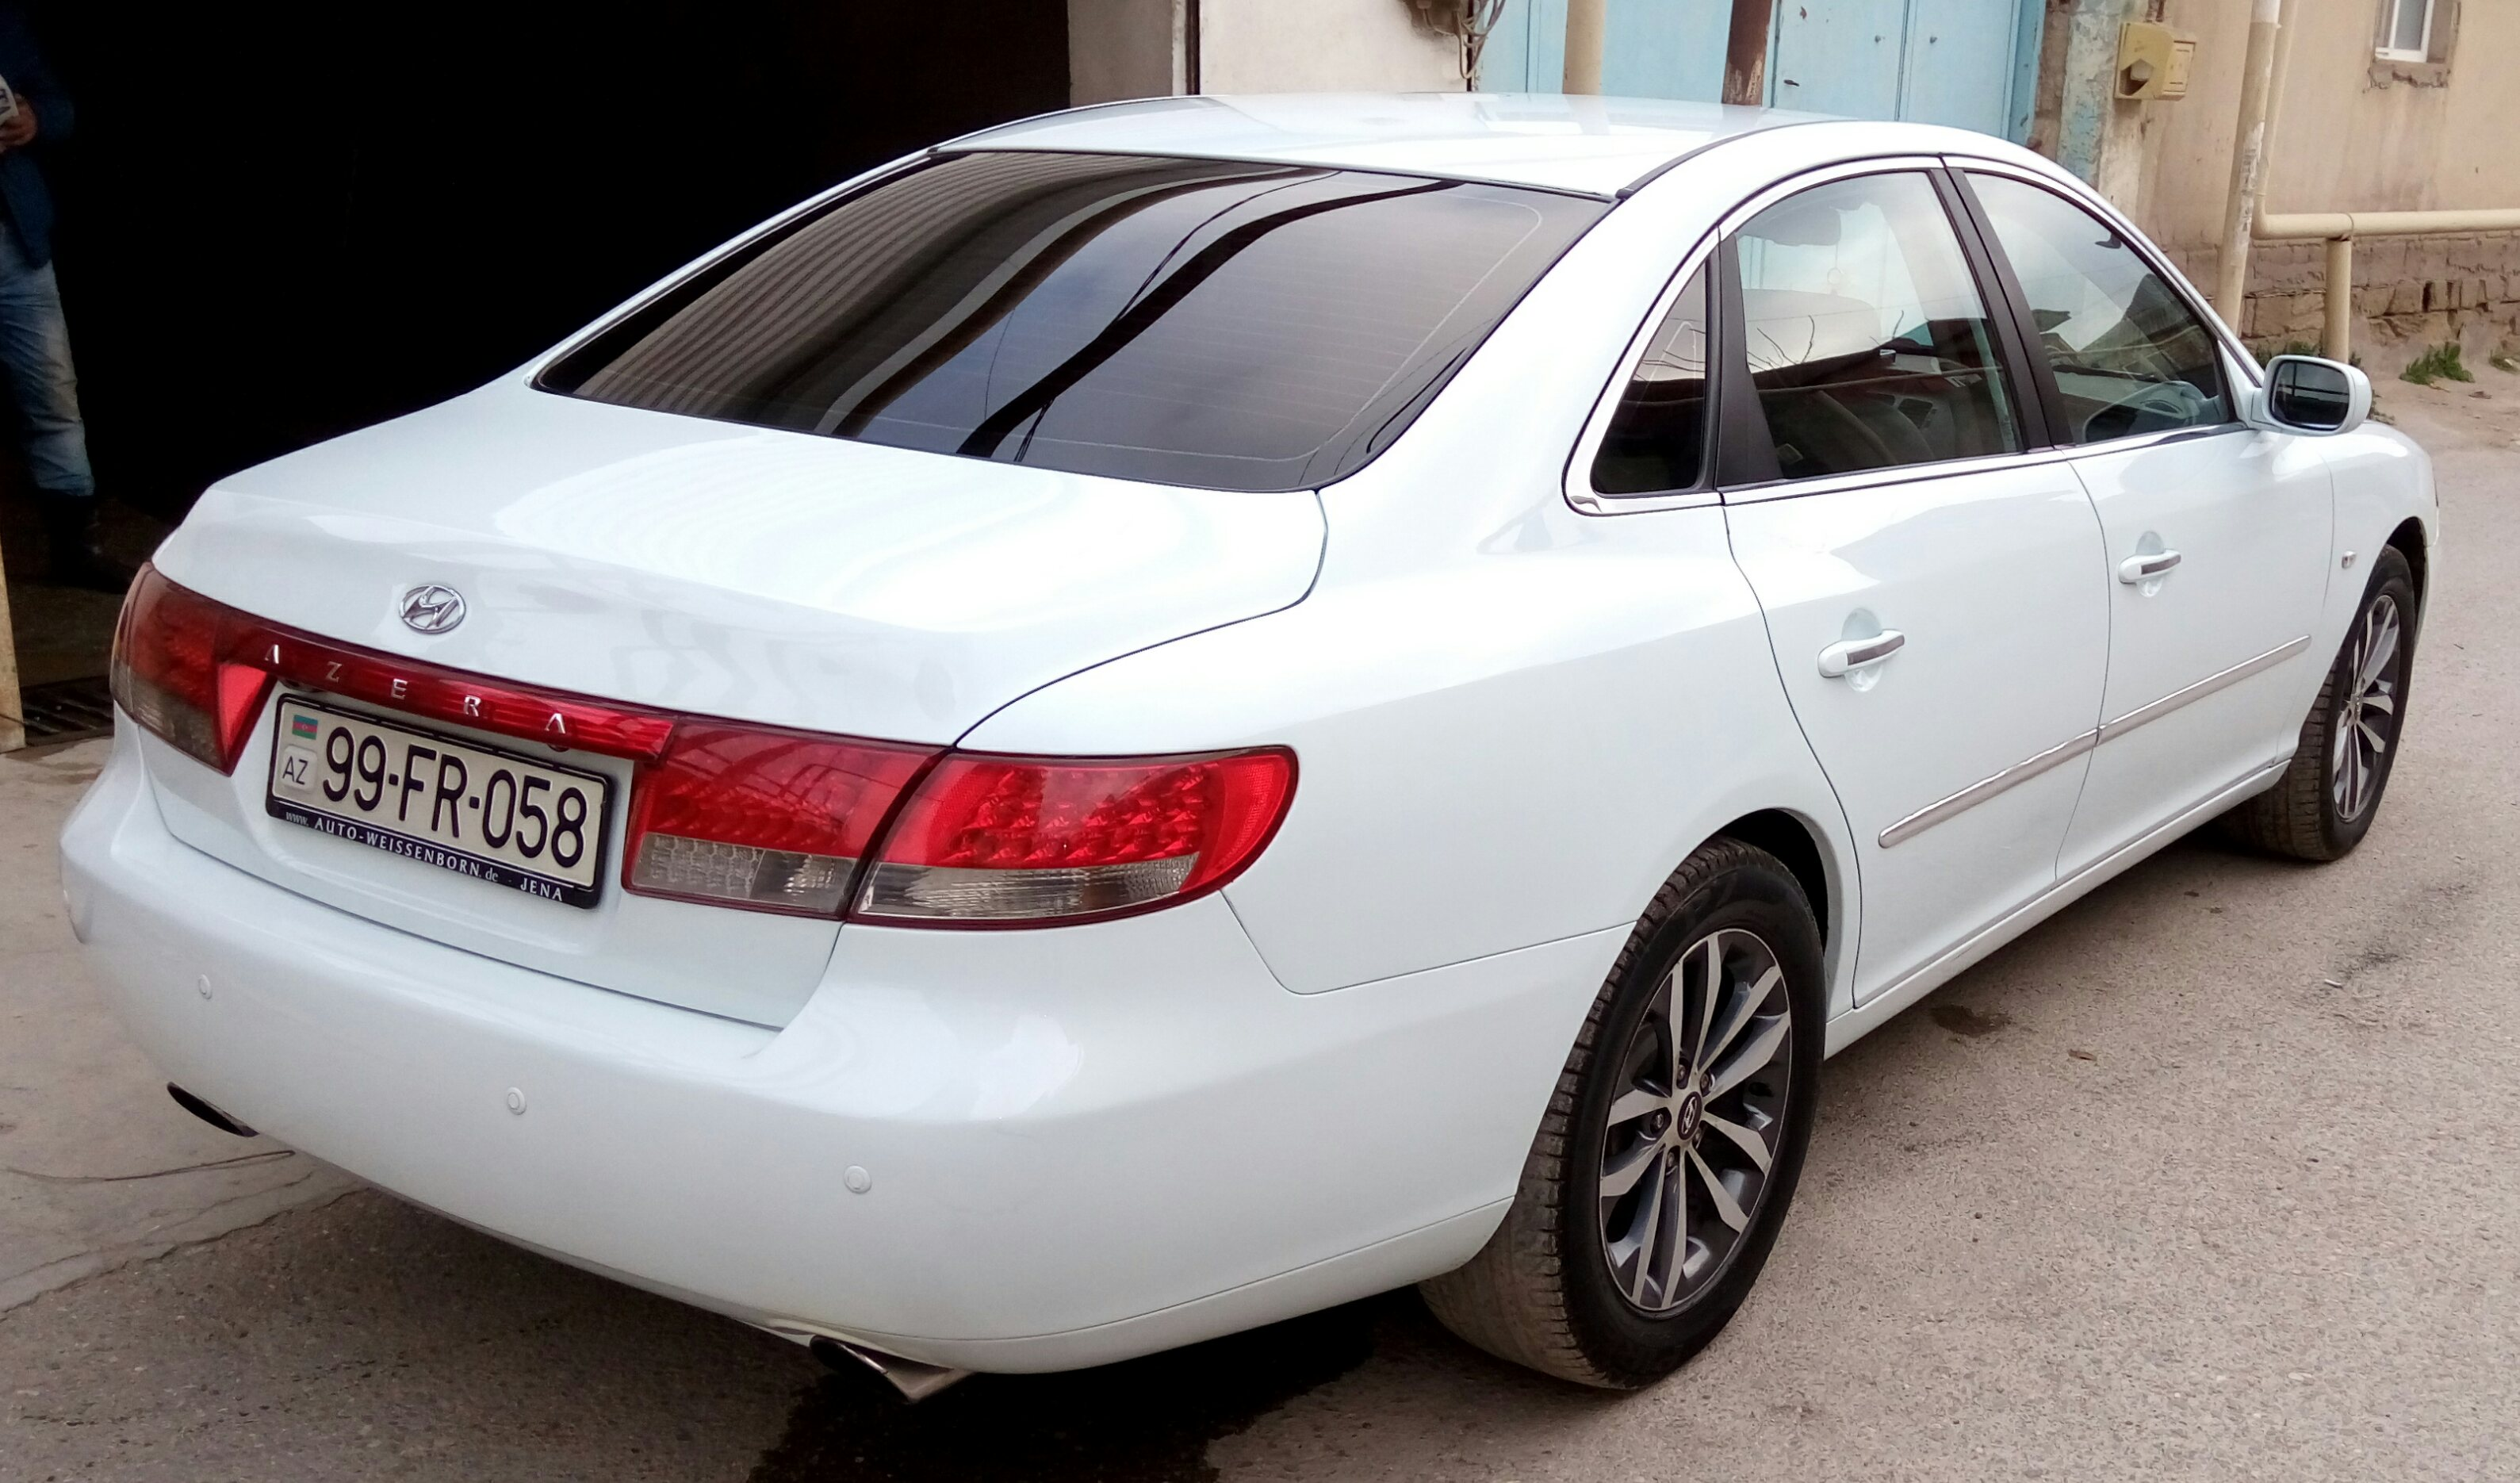 Hyundai Grandeur/Azera 2.2(lt) 2007 İkinci əl  $9500